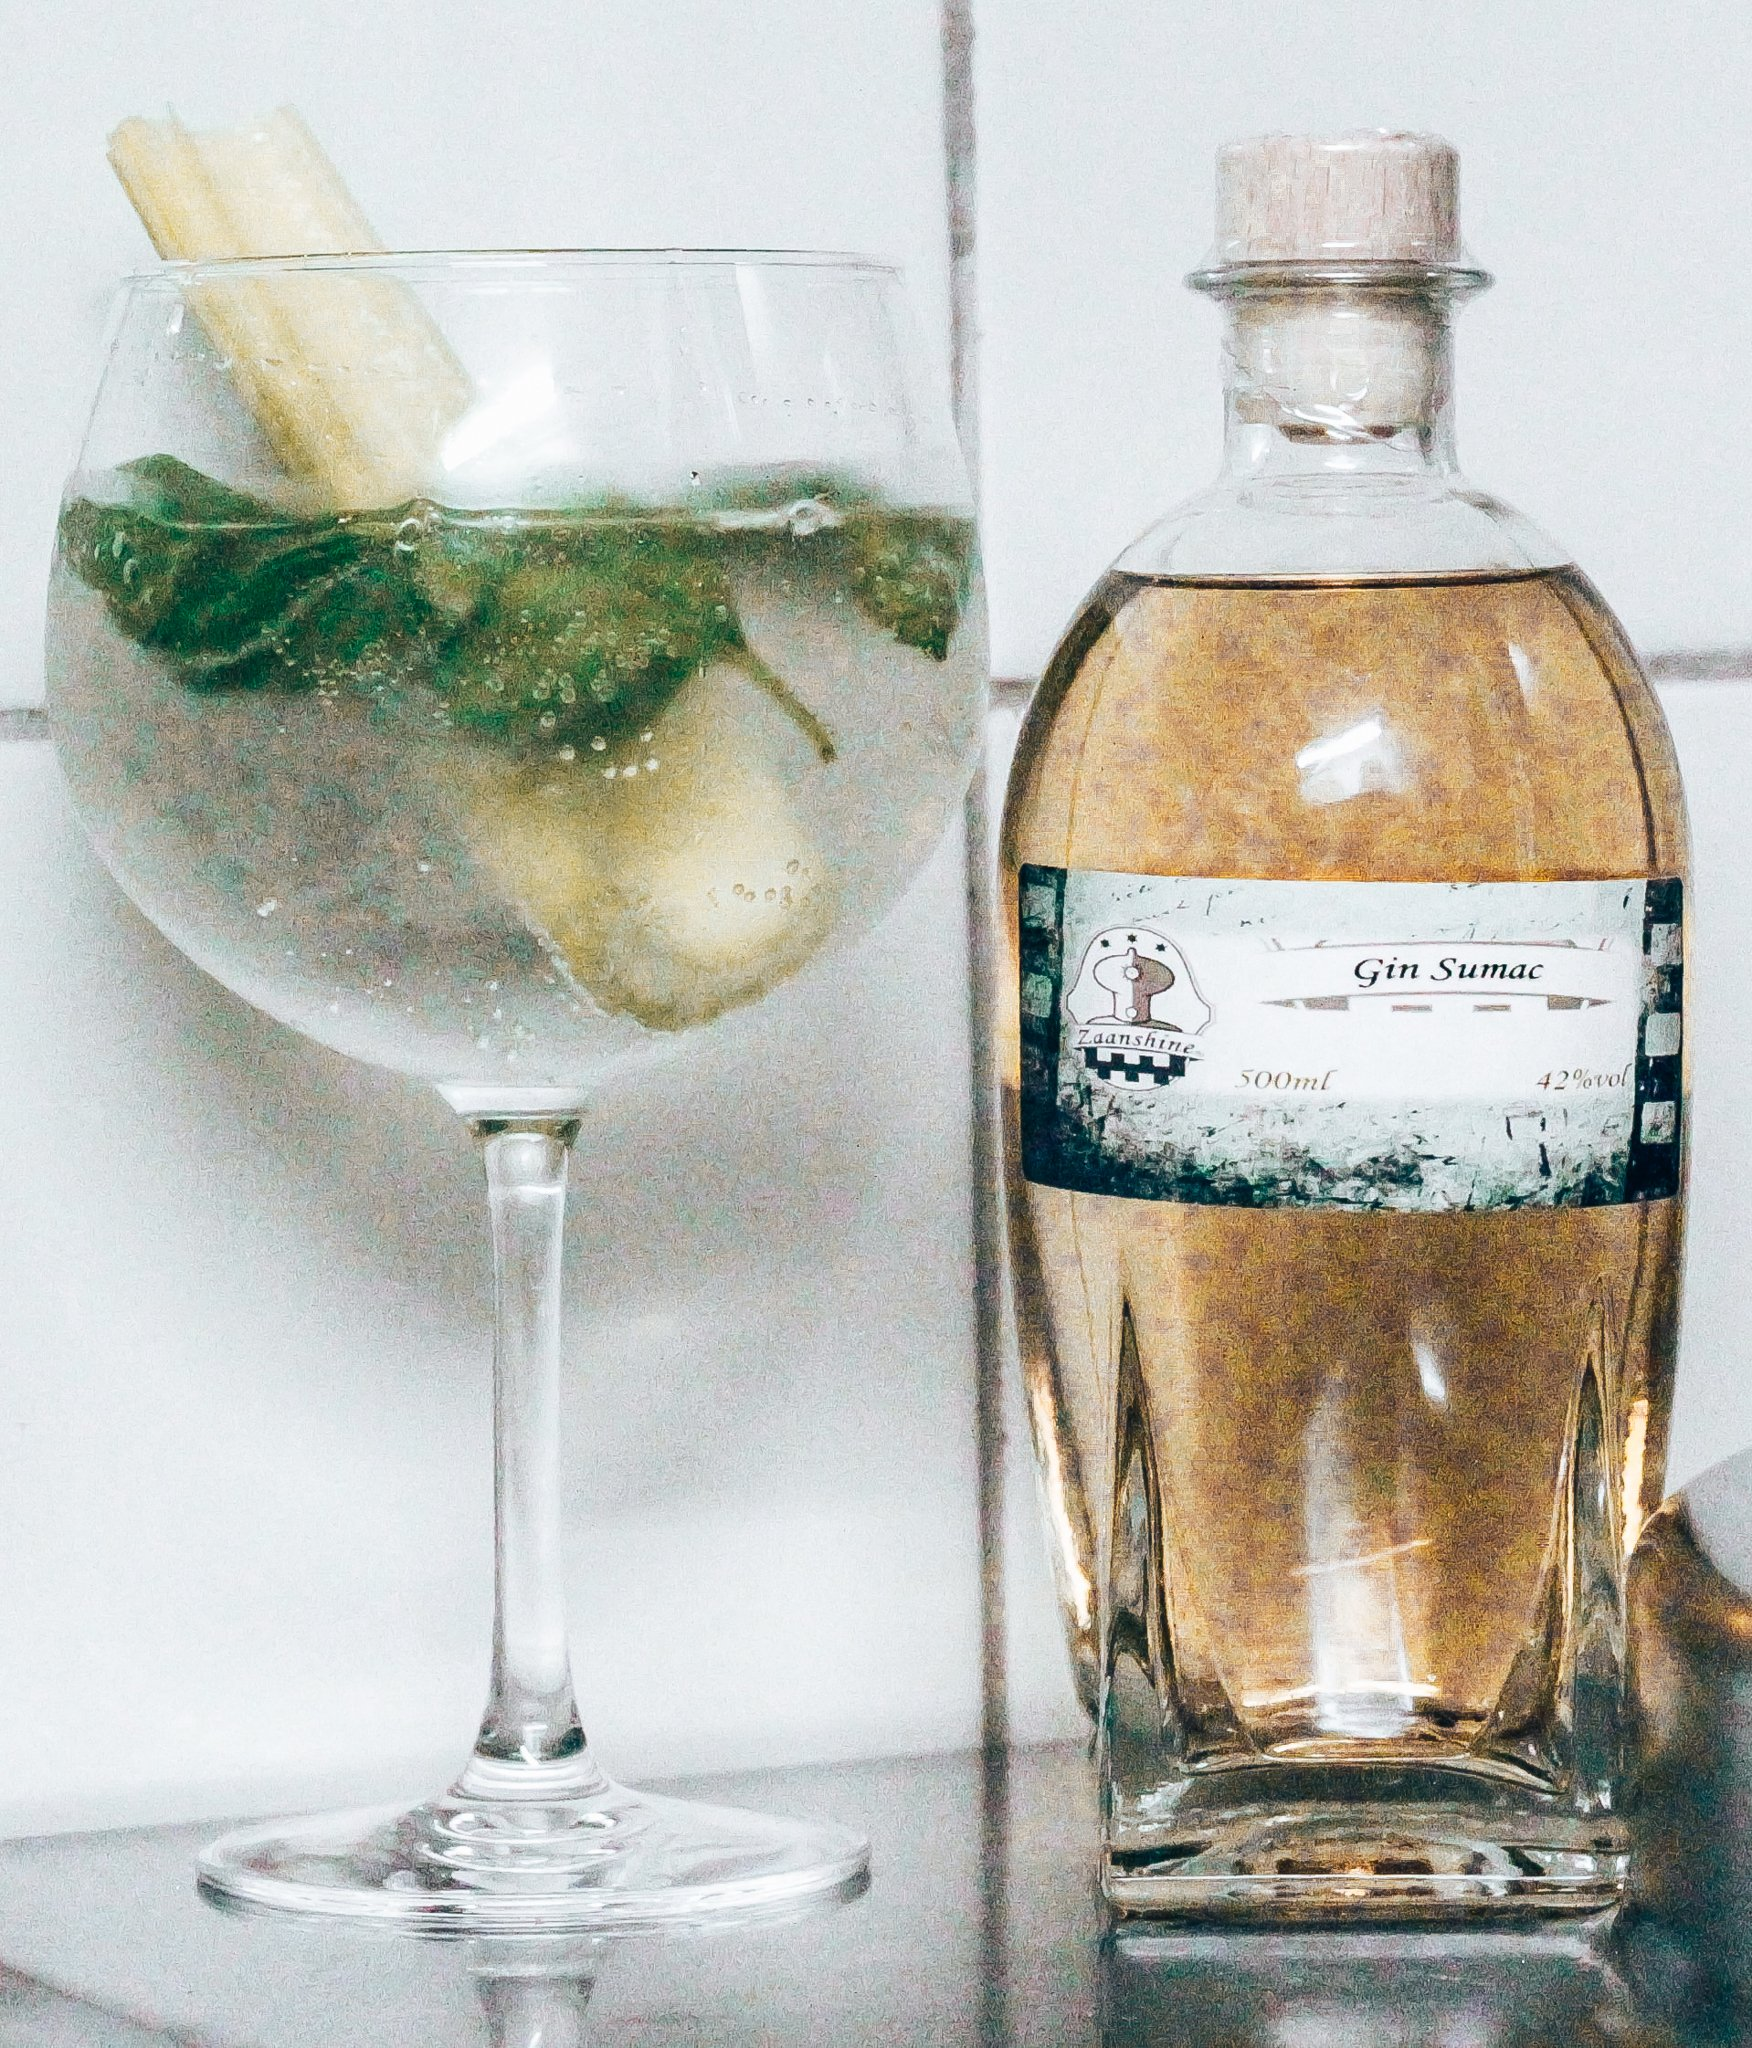 Gin Sumac perfect serve, Zaanshine Distilleerderij, Alles over gin.